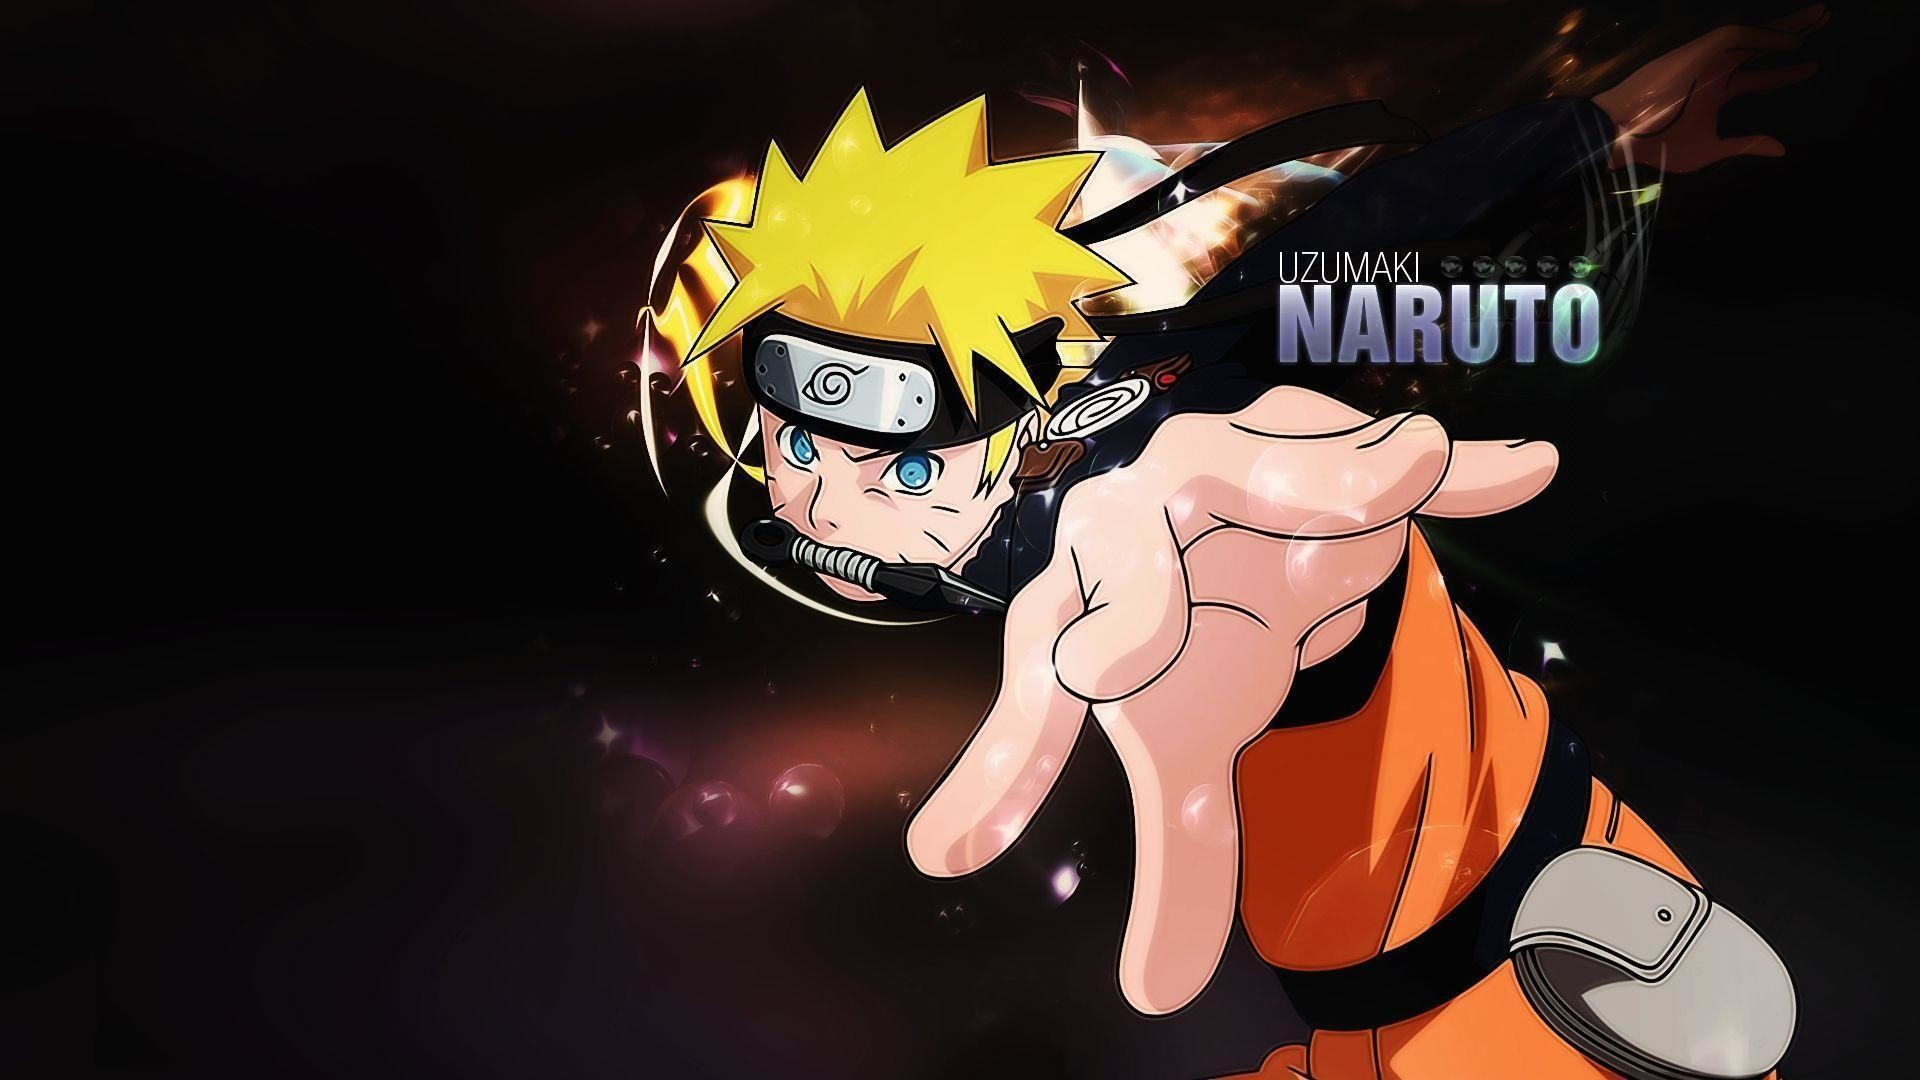 Naruto Uzumaki Shippuden Wallpaper 64 Pictures